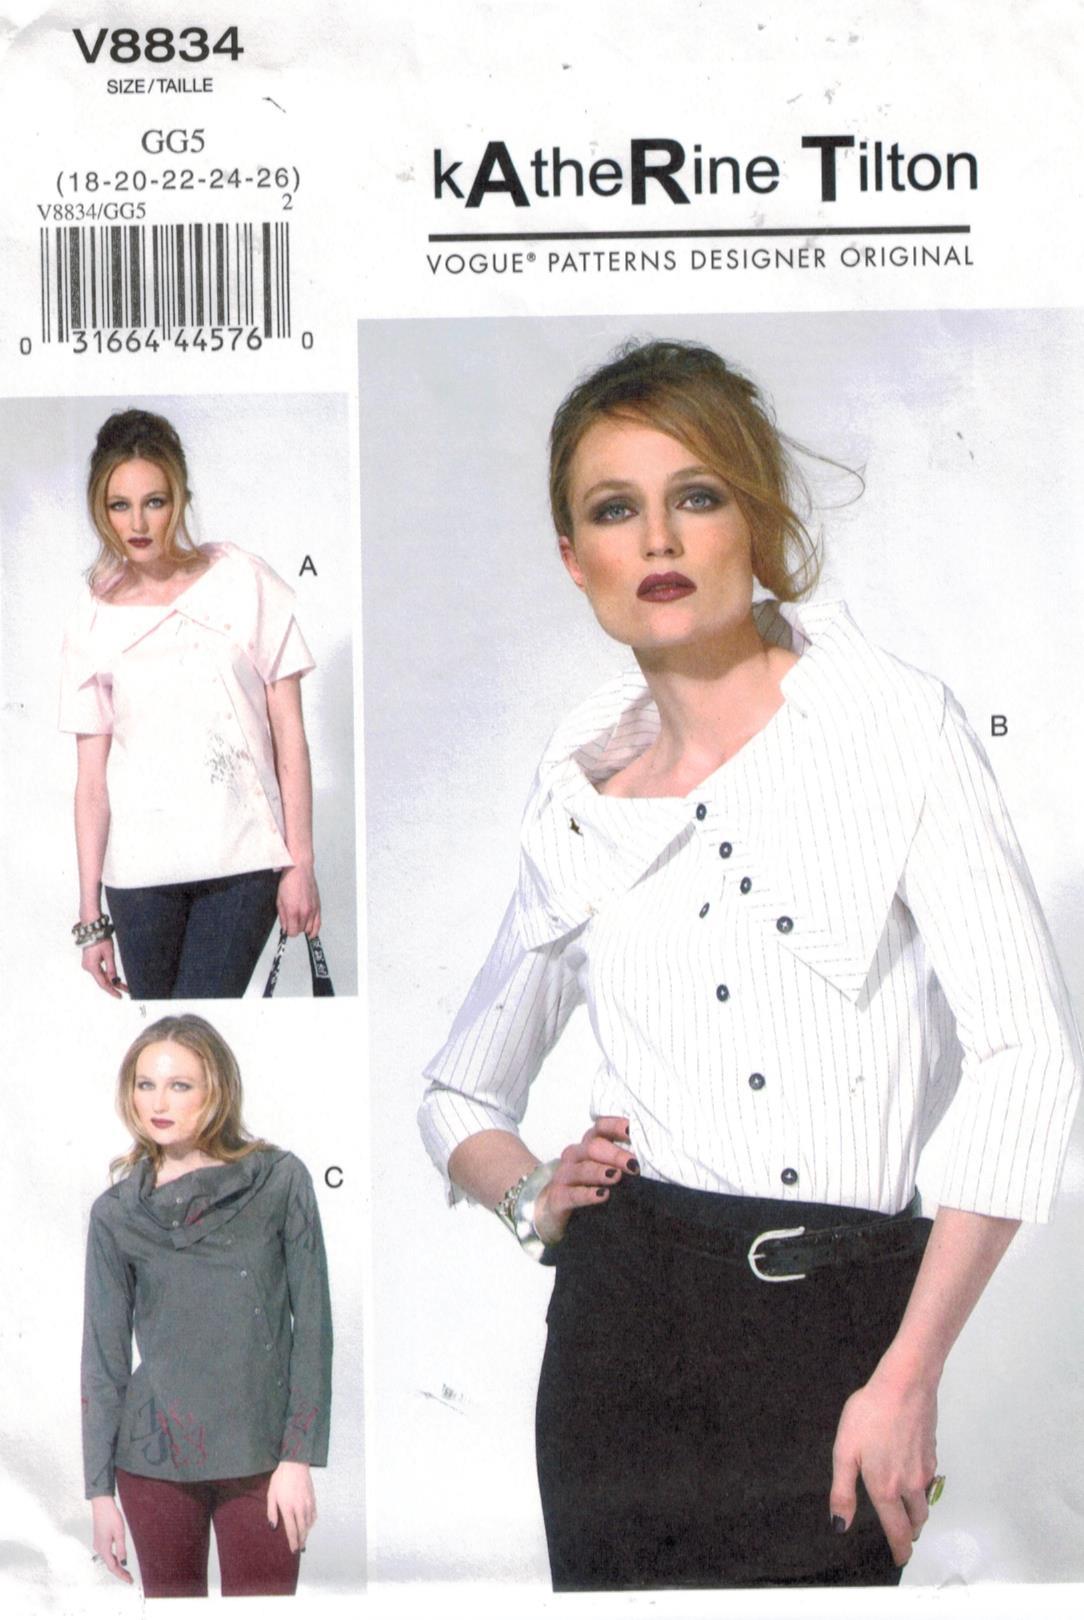 7f75dda864cc9 Vogue Pattern 8834 Katherine Tilton designer original blouses sizes 18 ...